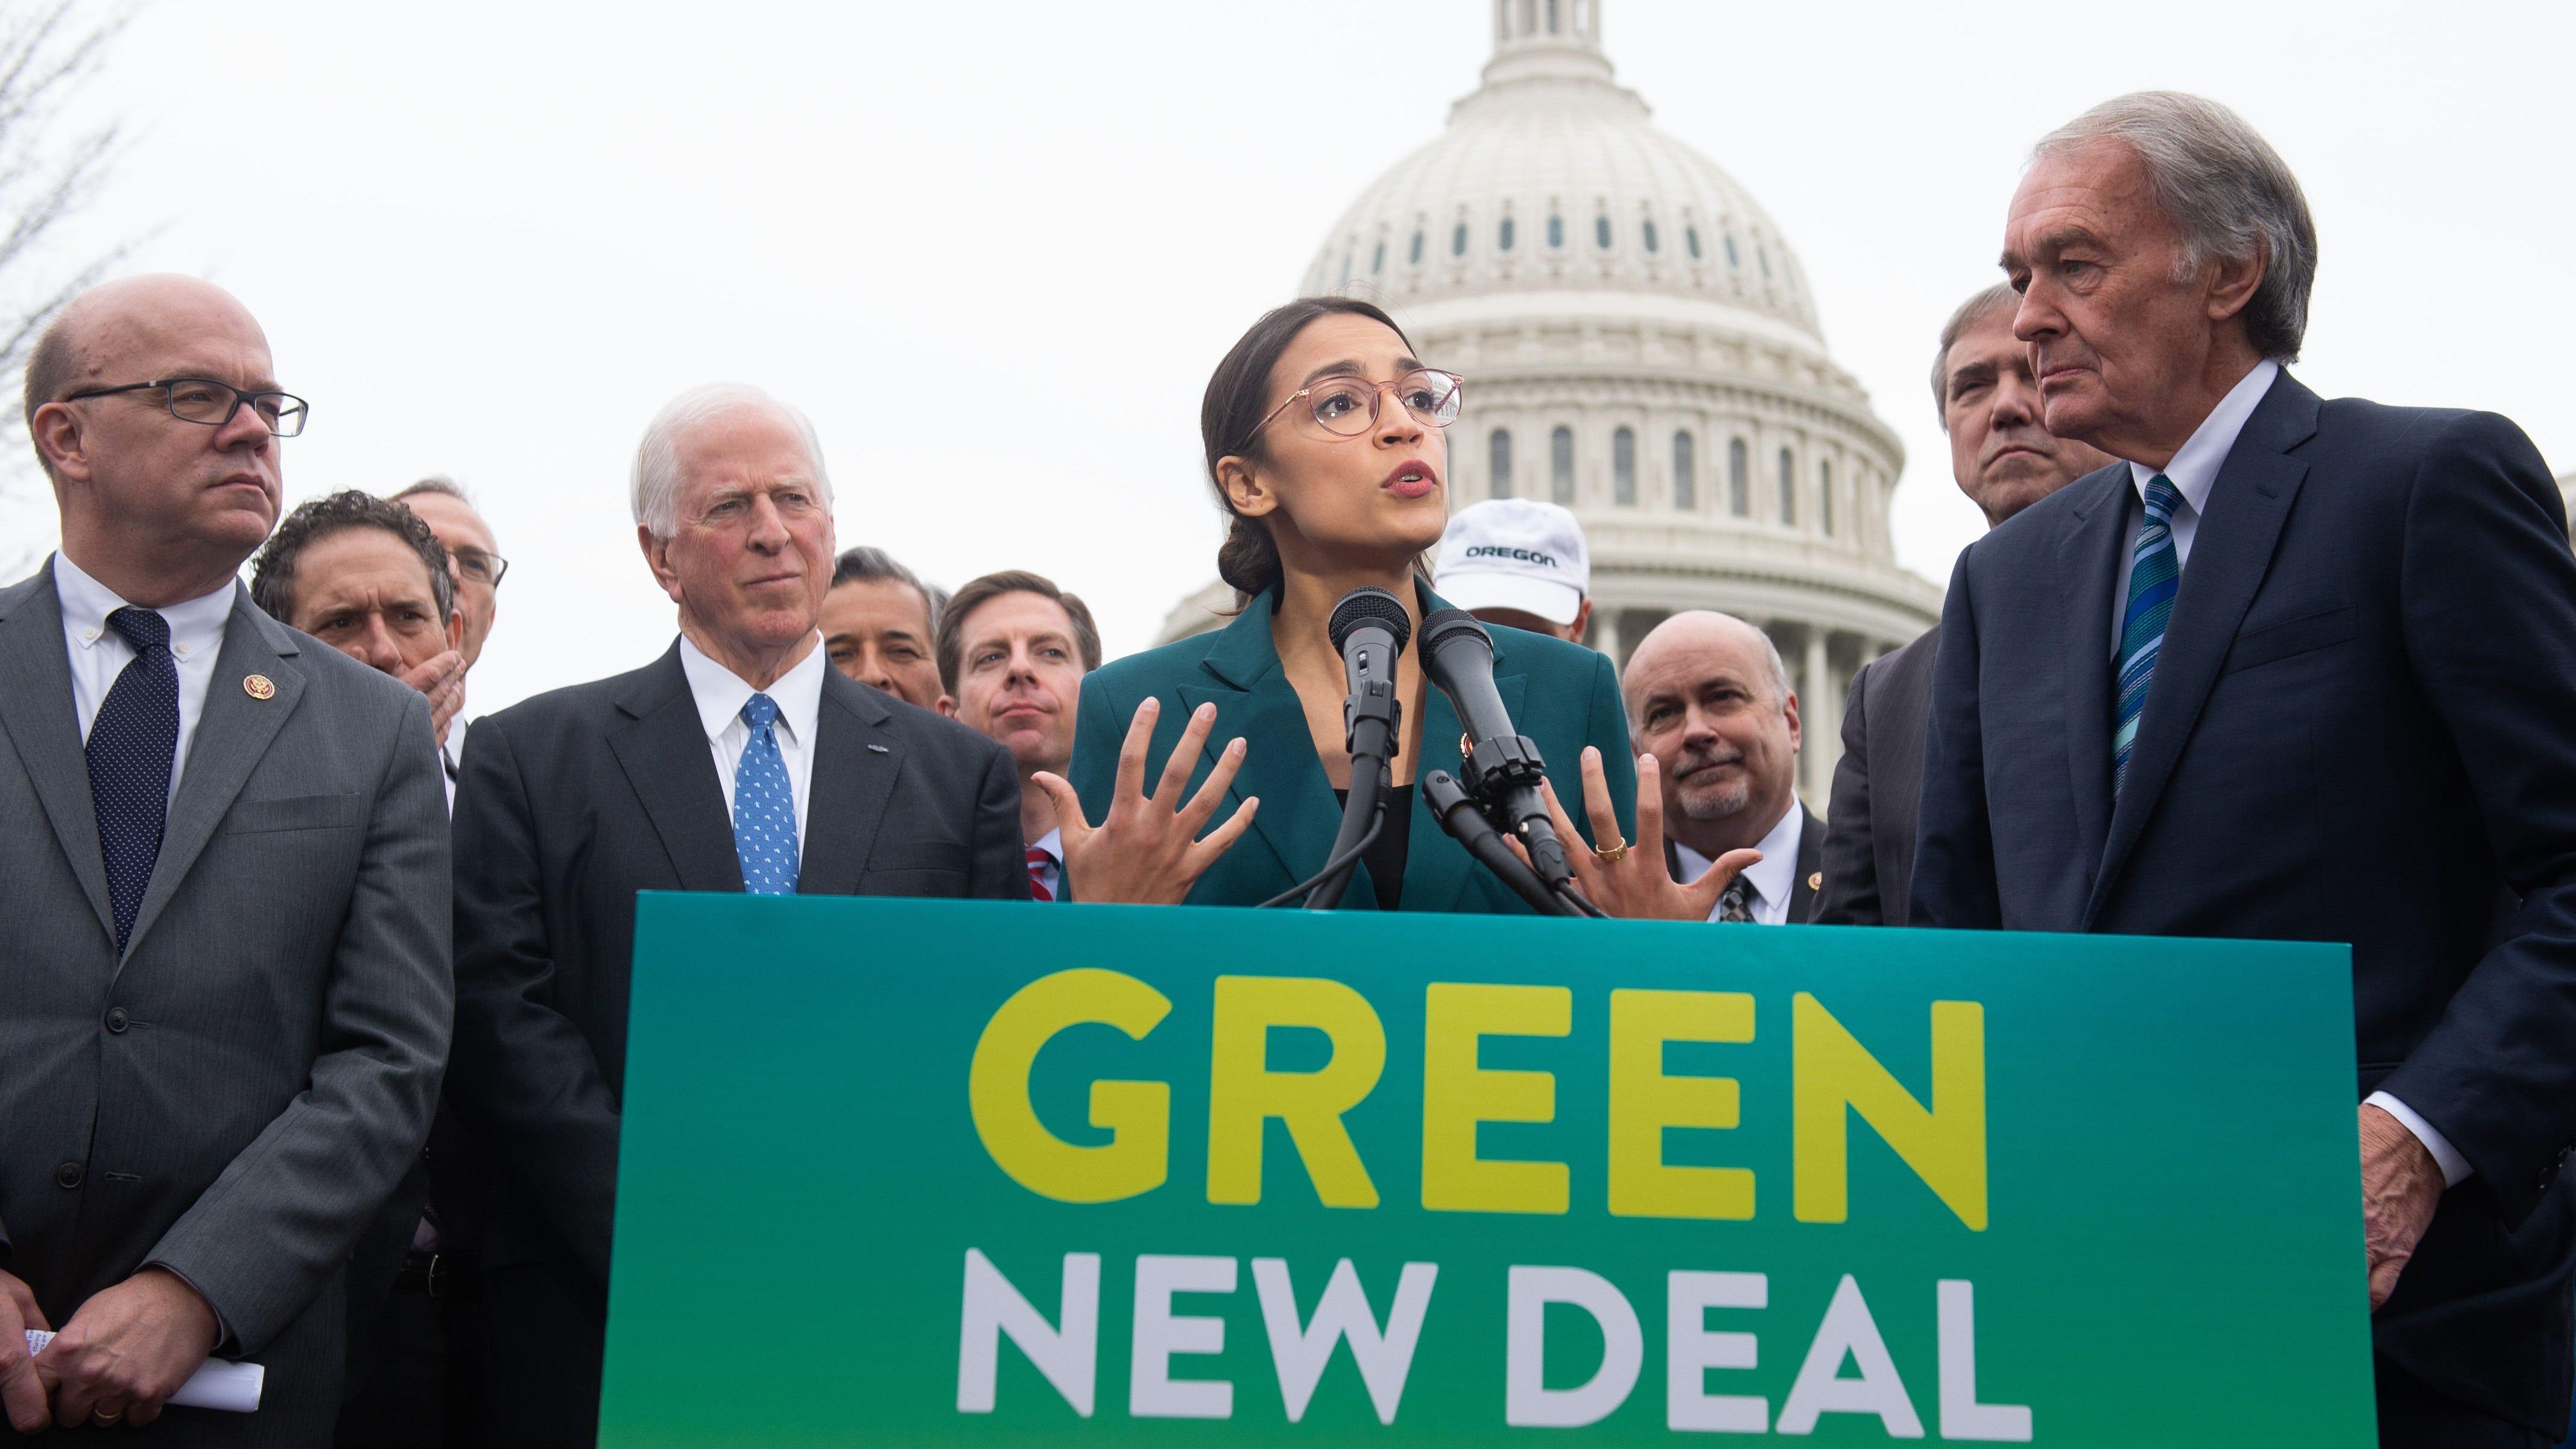 Democratic Rep. Alexandria Ocasio-Cortez of New York and Sen. Ed Markey of Massachusetts, right, announce the Green New Deal legislation on Feb. 7, 2019.